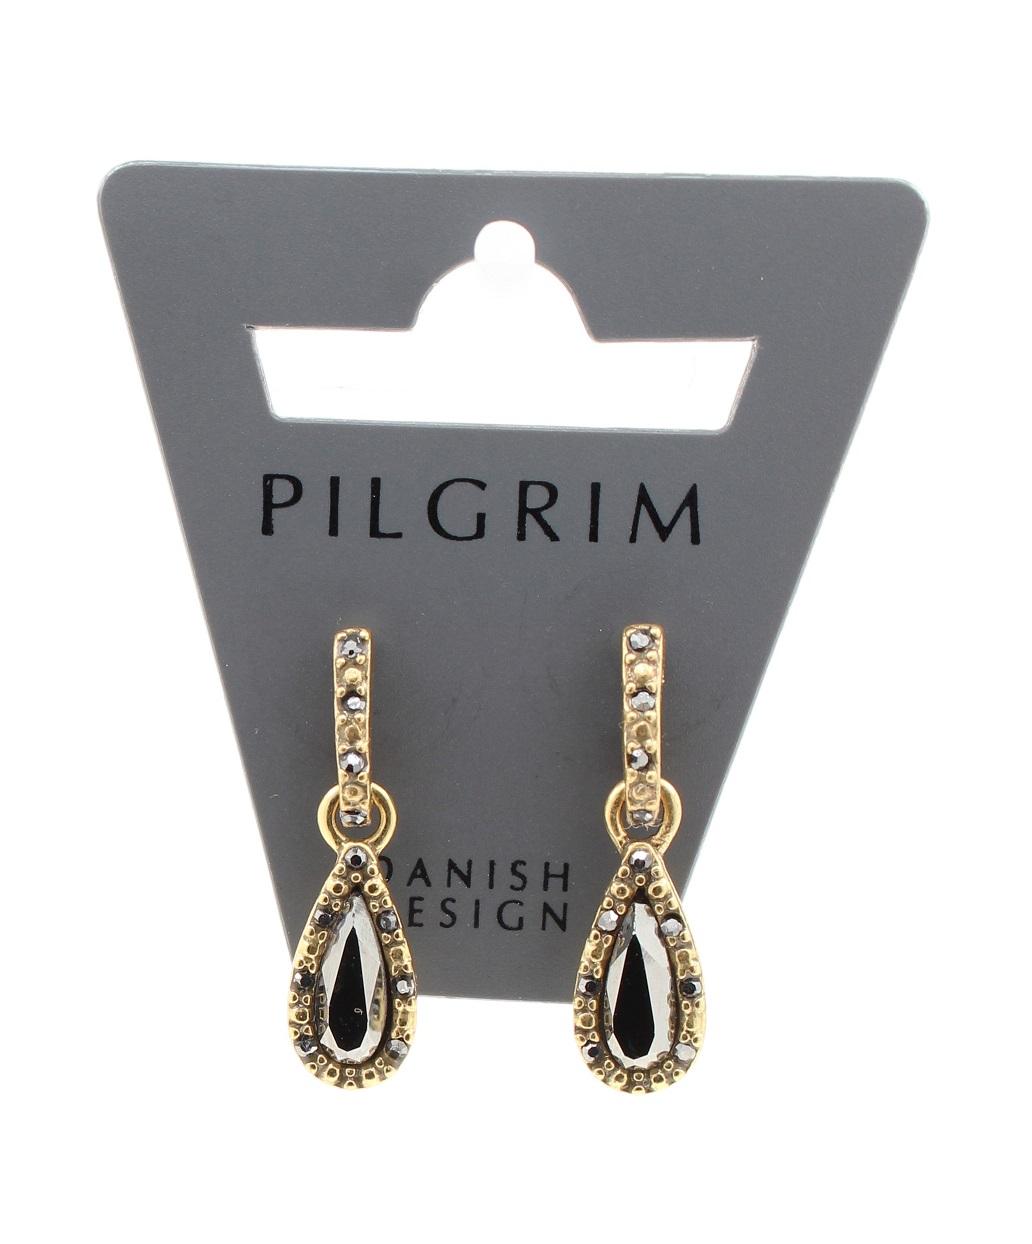 PILGRIM - Delicate Night - Crystal Earrings - Gold Plate/Haematite BNWT